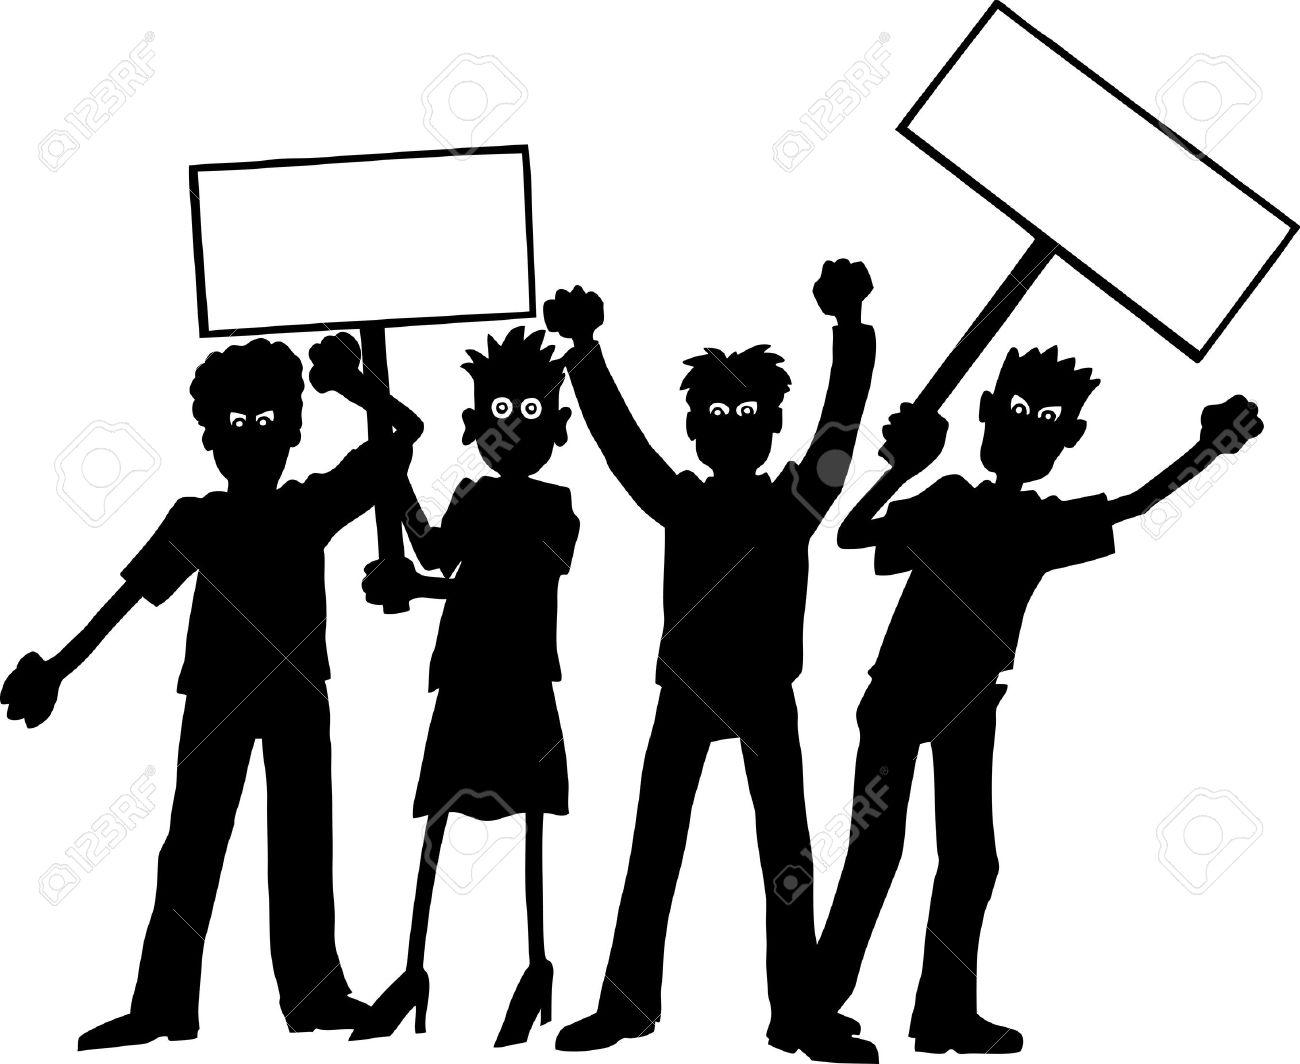 Riot clipart protest 100 Clipart Clipart Protest Clipart